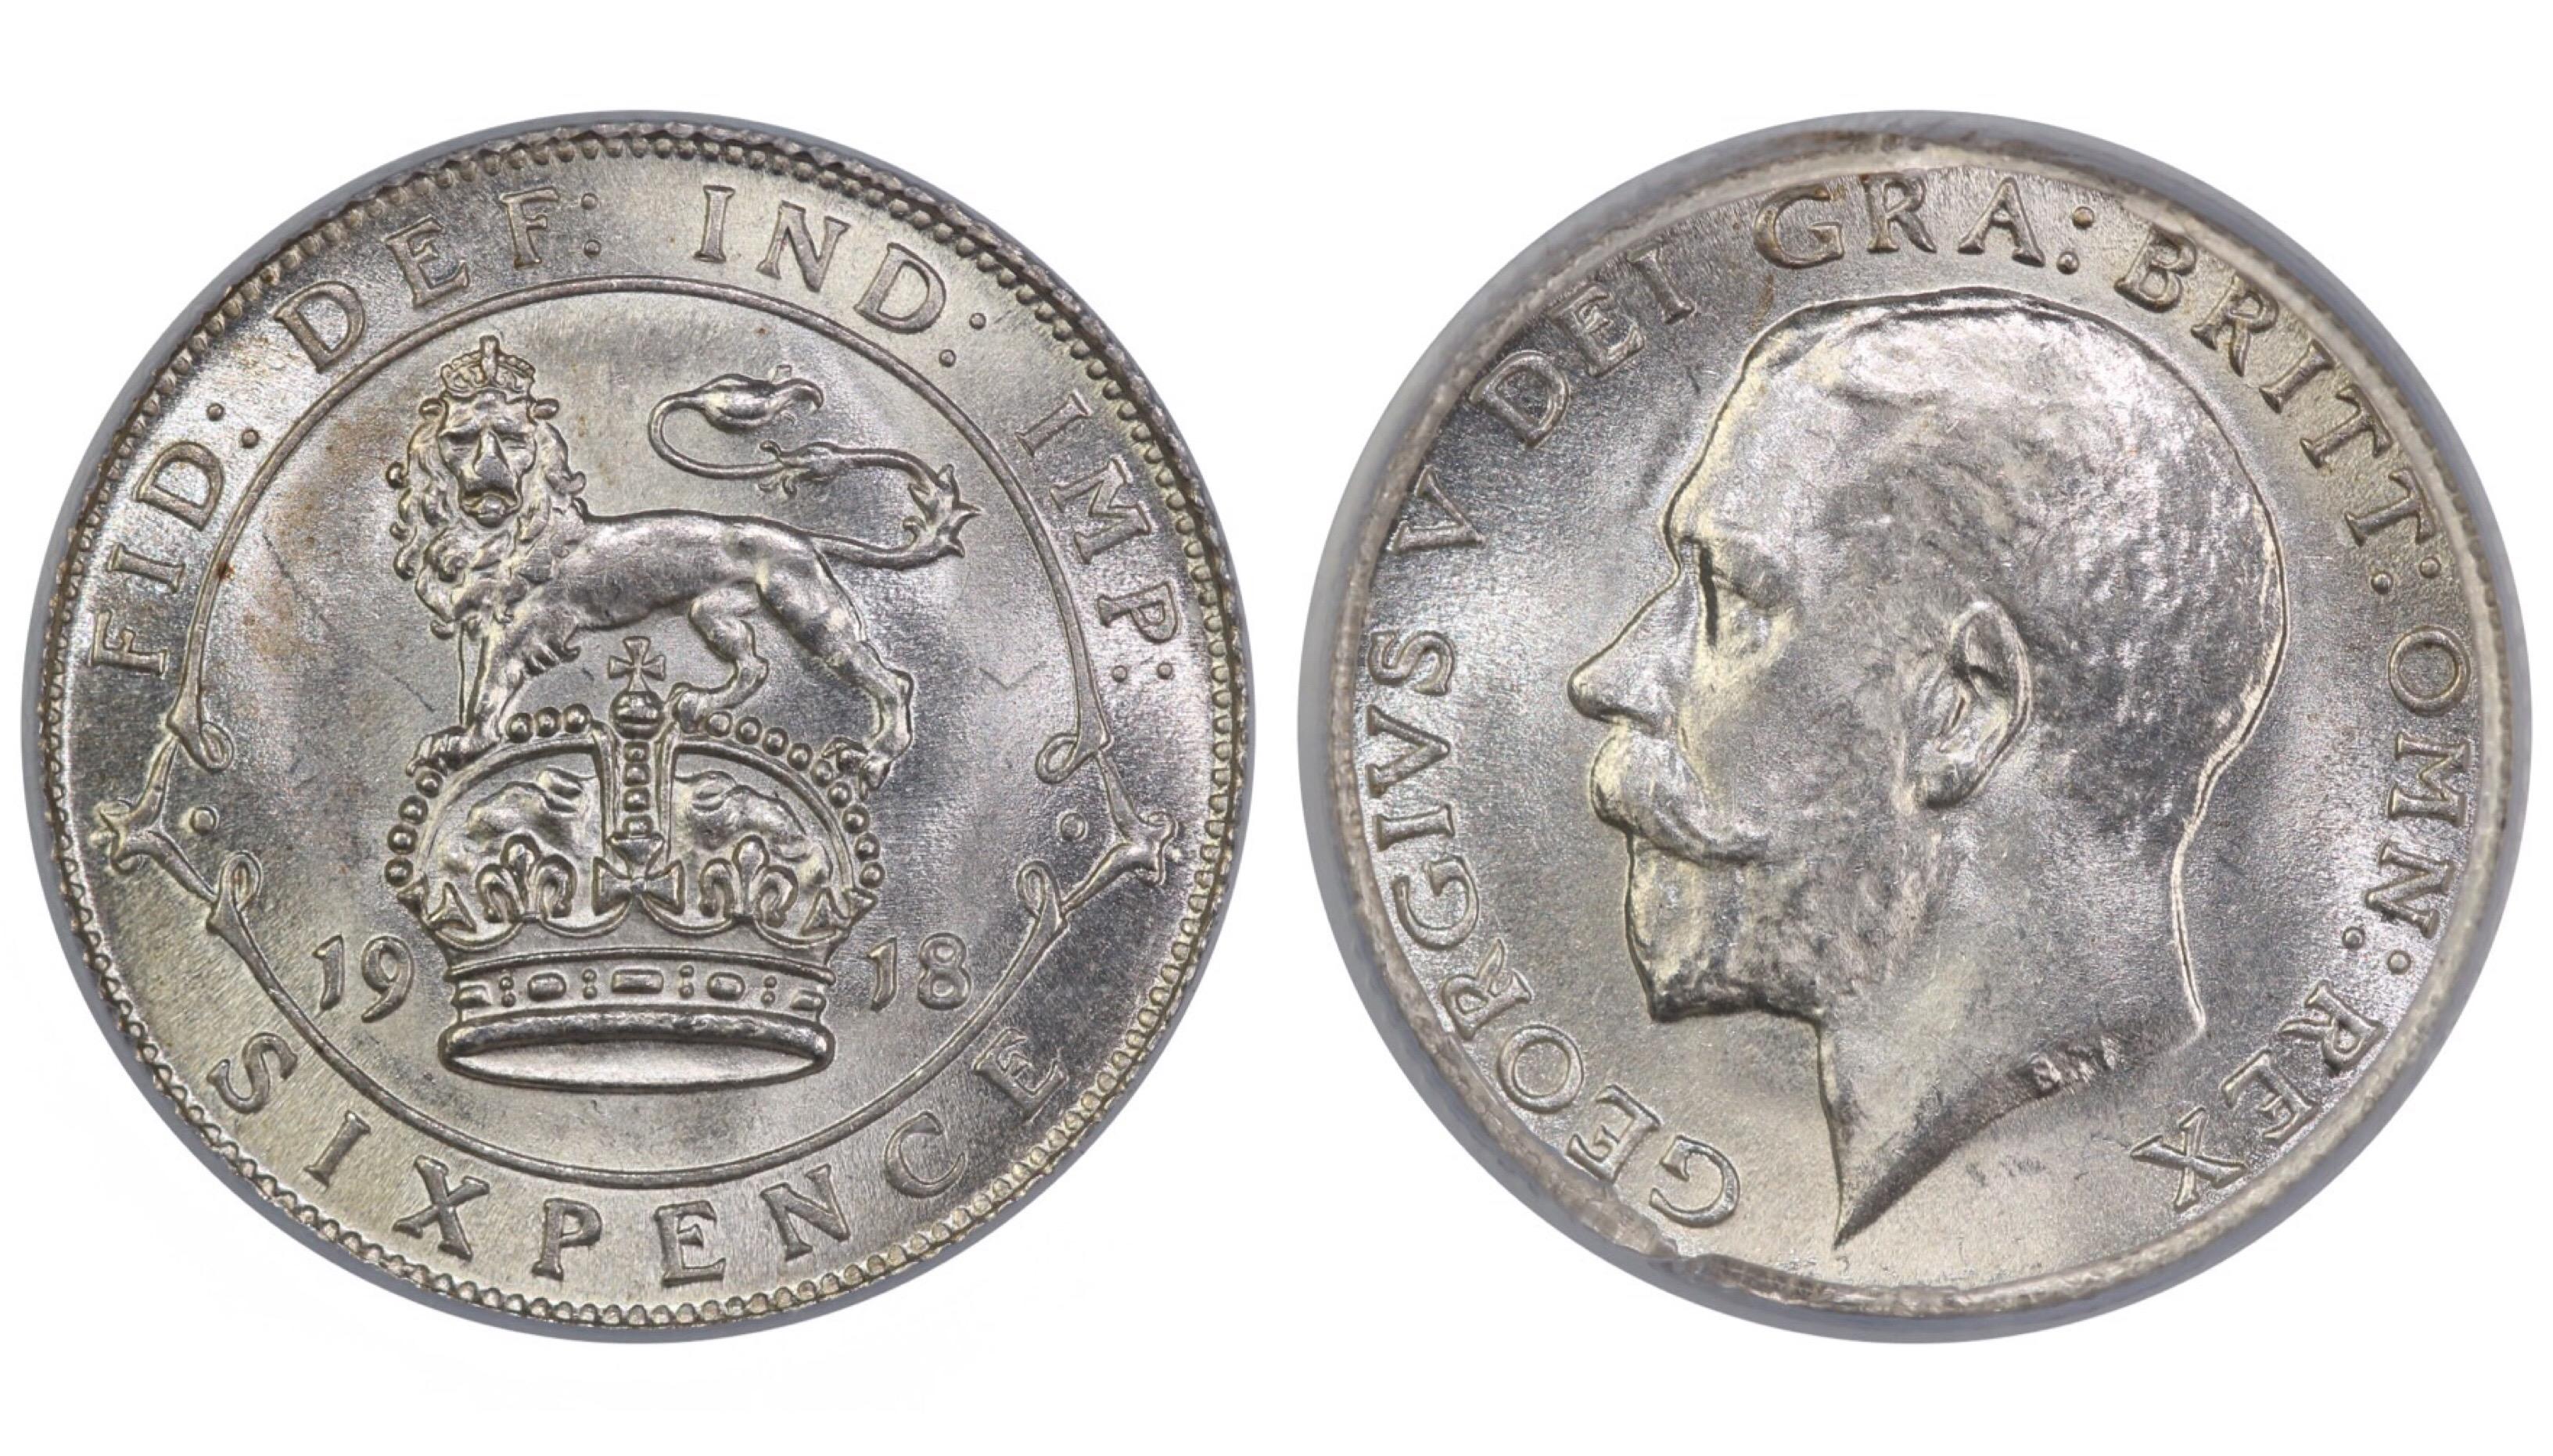 1918 Sixpence, CGS 80, George V, ESC  1803, UIN 22848